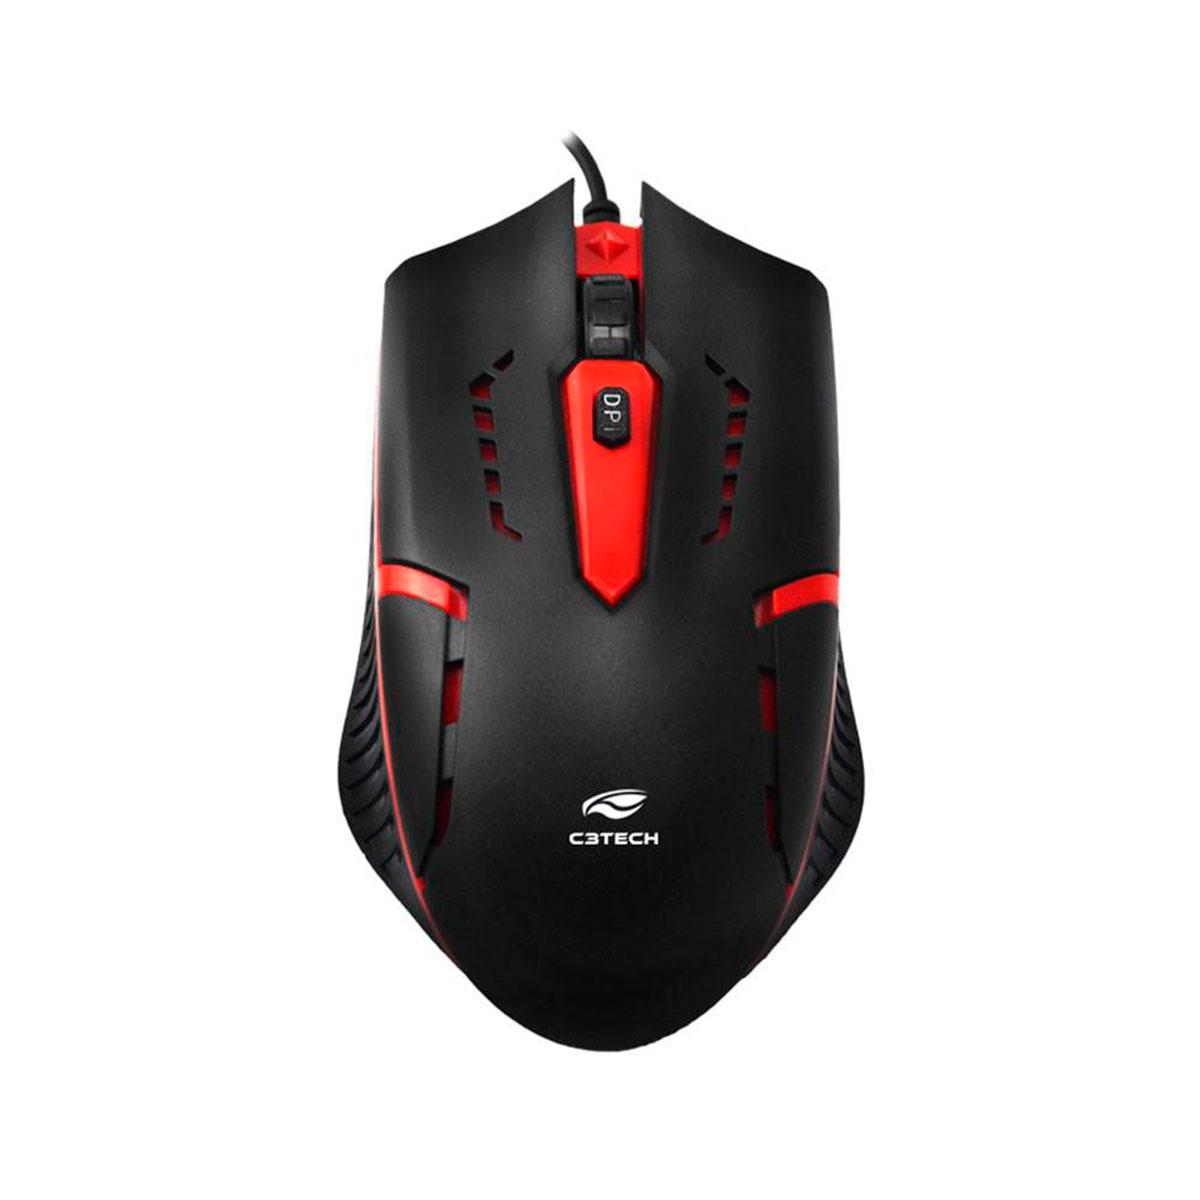 Kit Teclado e Mouse Gamer C3Tech GK-20BK, ABNT2, USB, 1200DPI